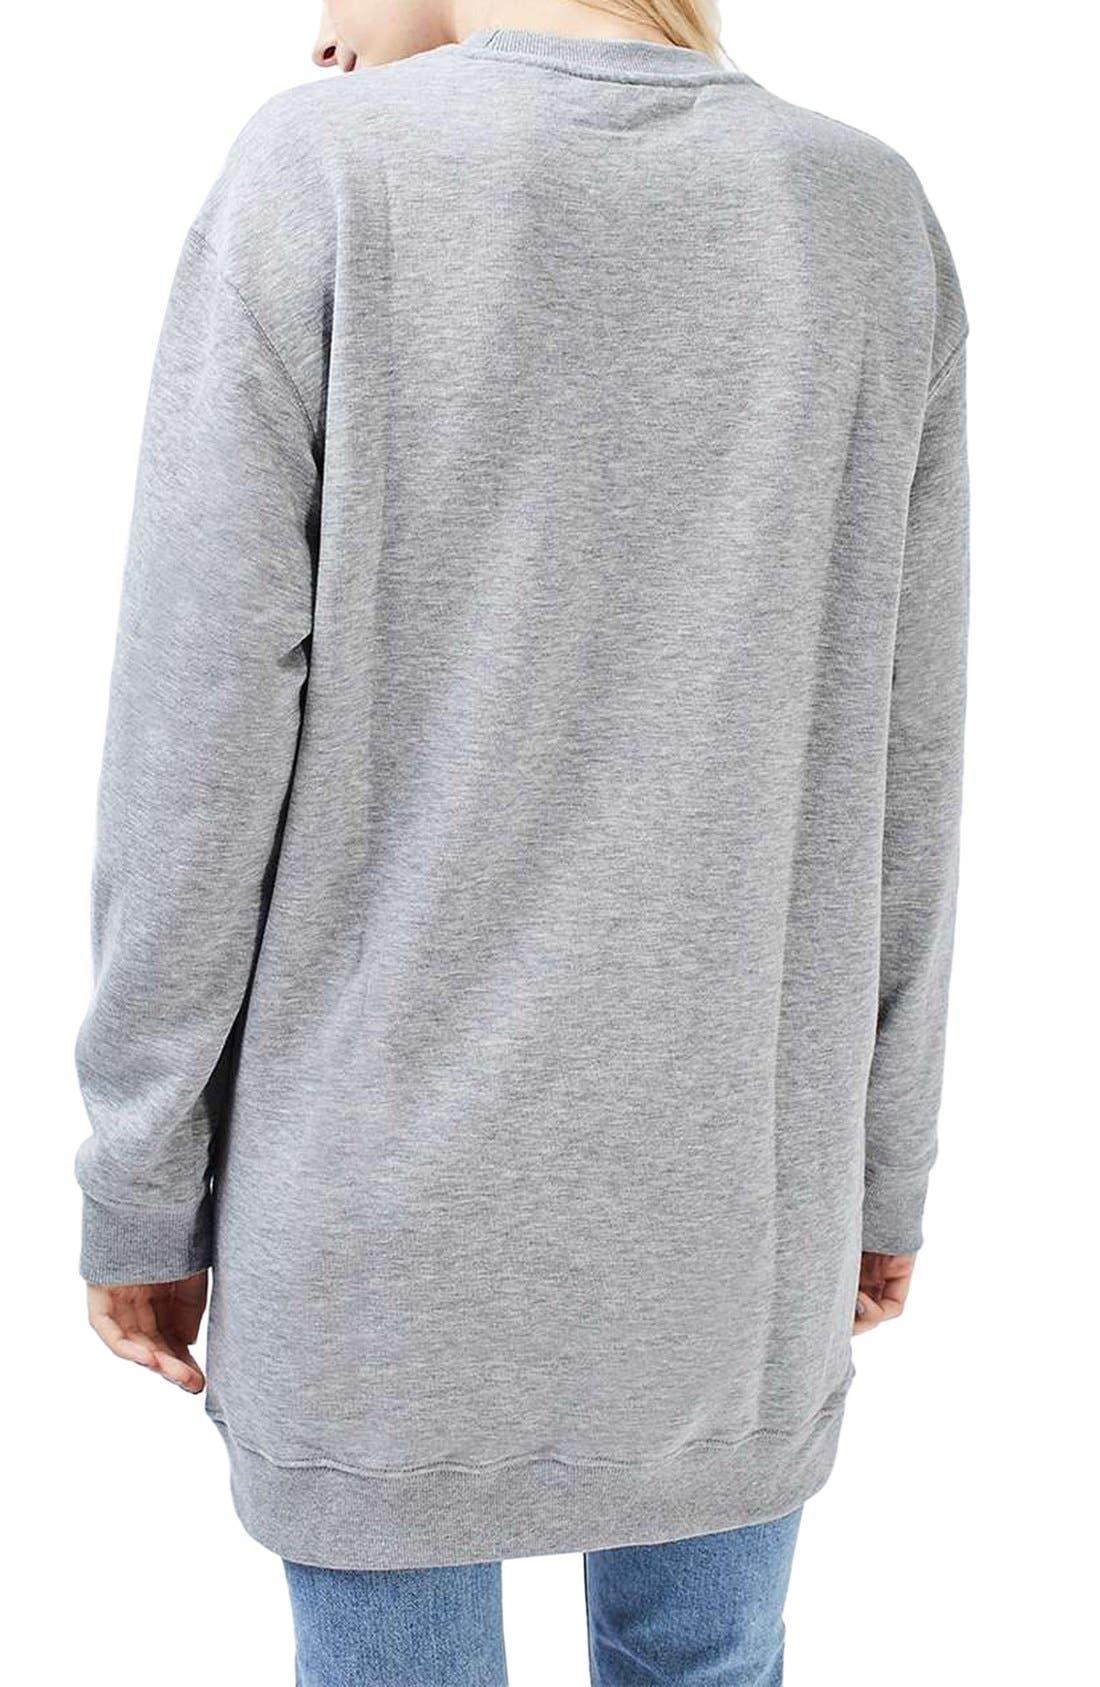 Alternate Image 3  - Topshop Sweatshirt Tunic